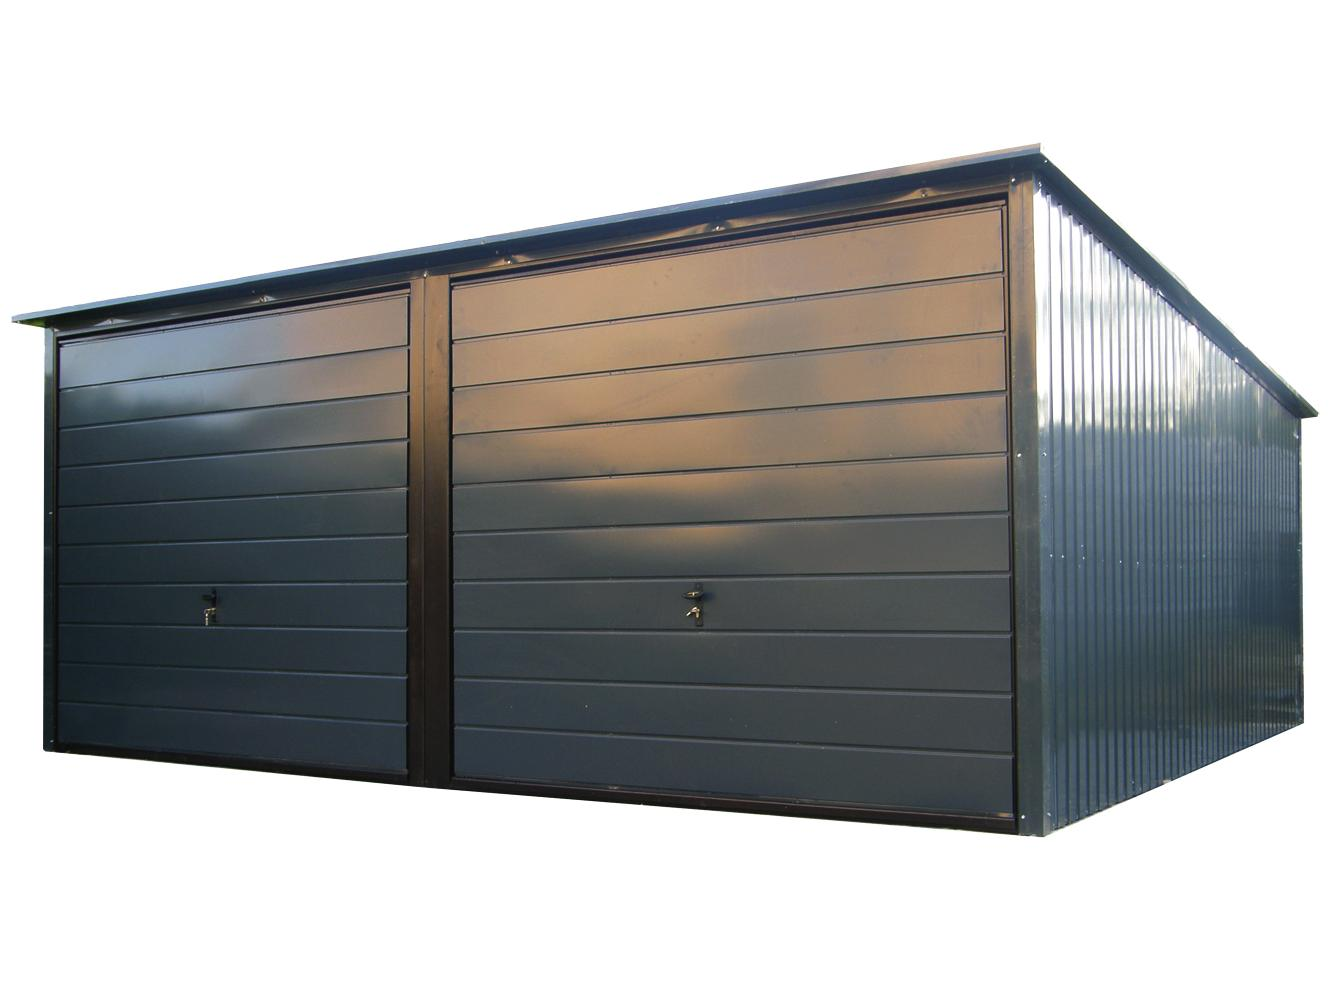 Garaż Blaszany Blaszak Podwójny 5x5 Premium Duży 7165144243